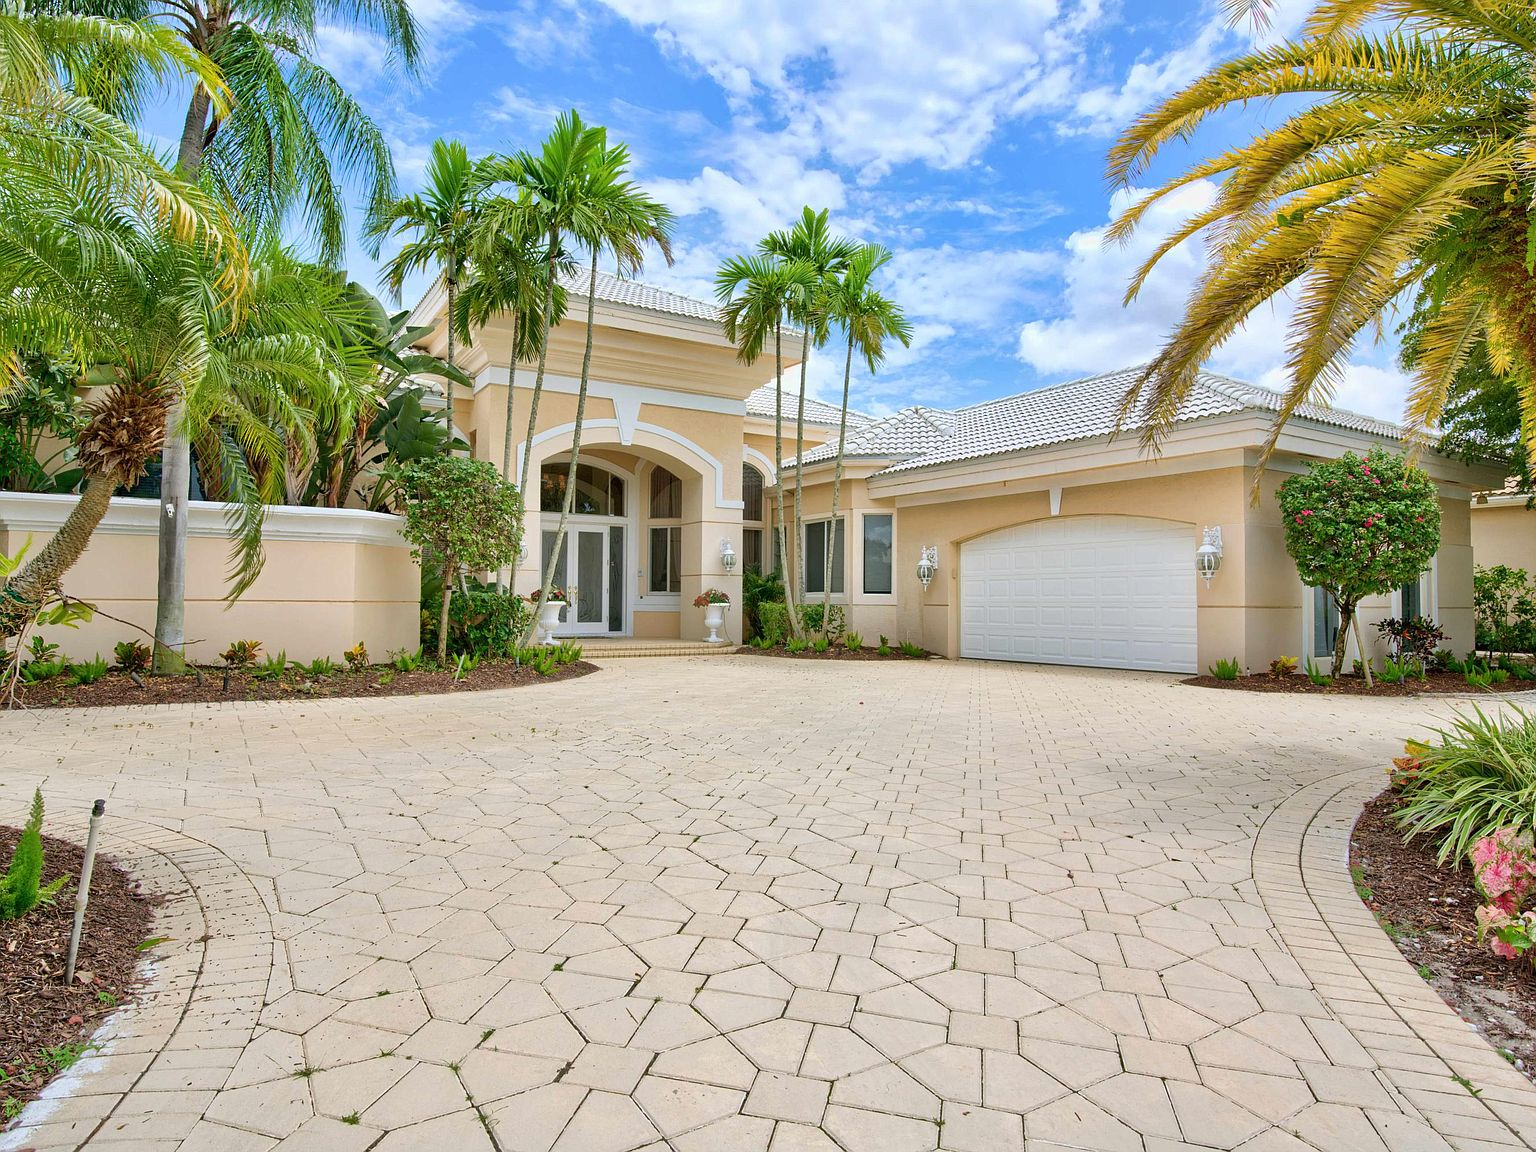 86c6102ed0cedd14b16a70f7677151fa cc ft 1536 - Horseshoe Acres Palm Beach Gardens Hoa